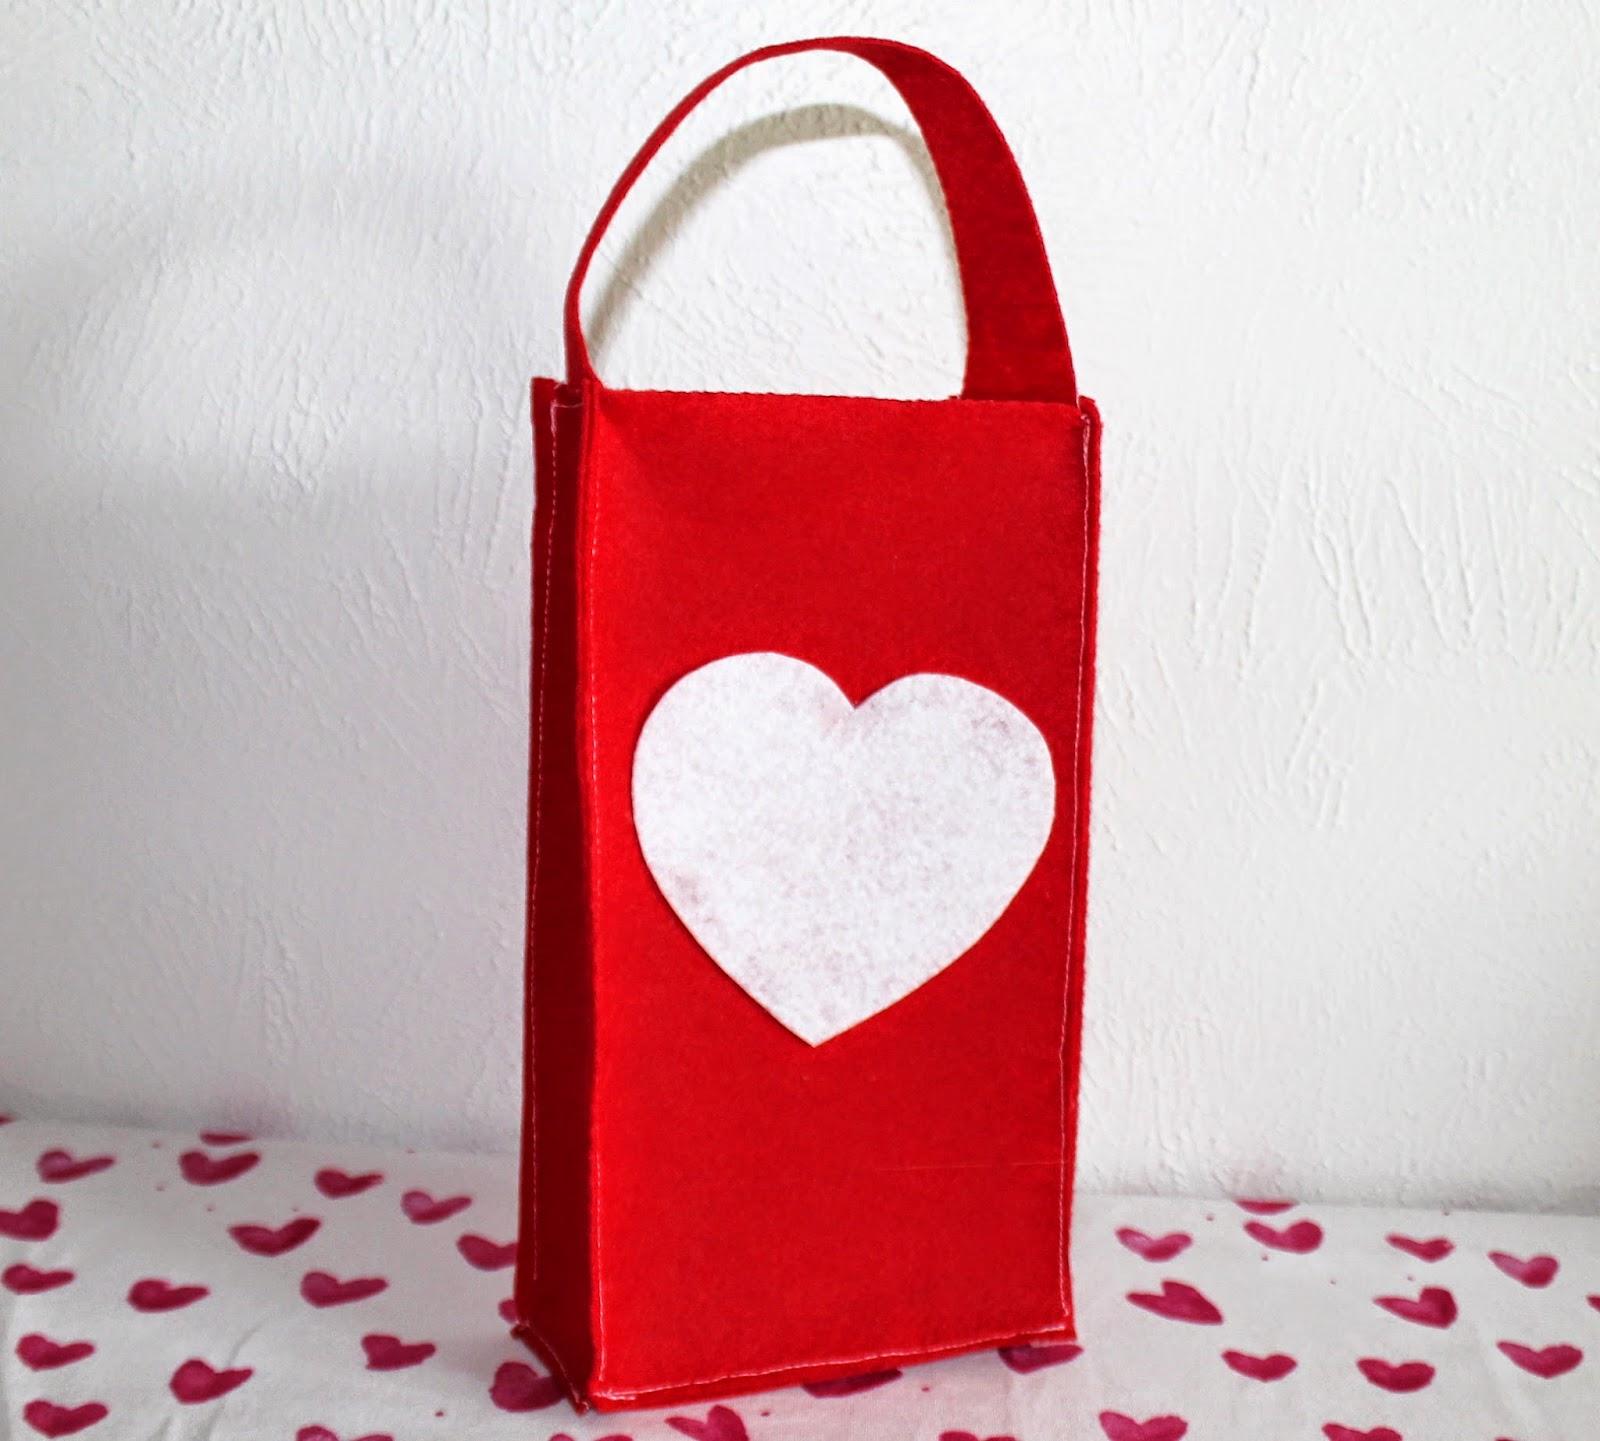 DIY Valentine's Day Felt Tote supplies | www.bubblesandgold.com